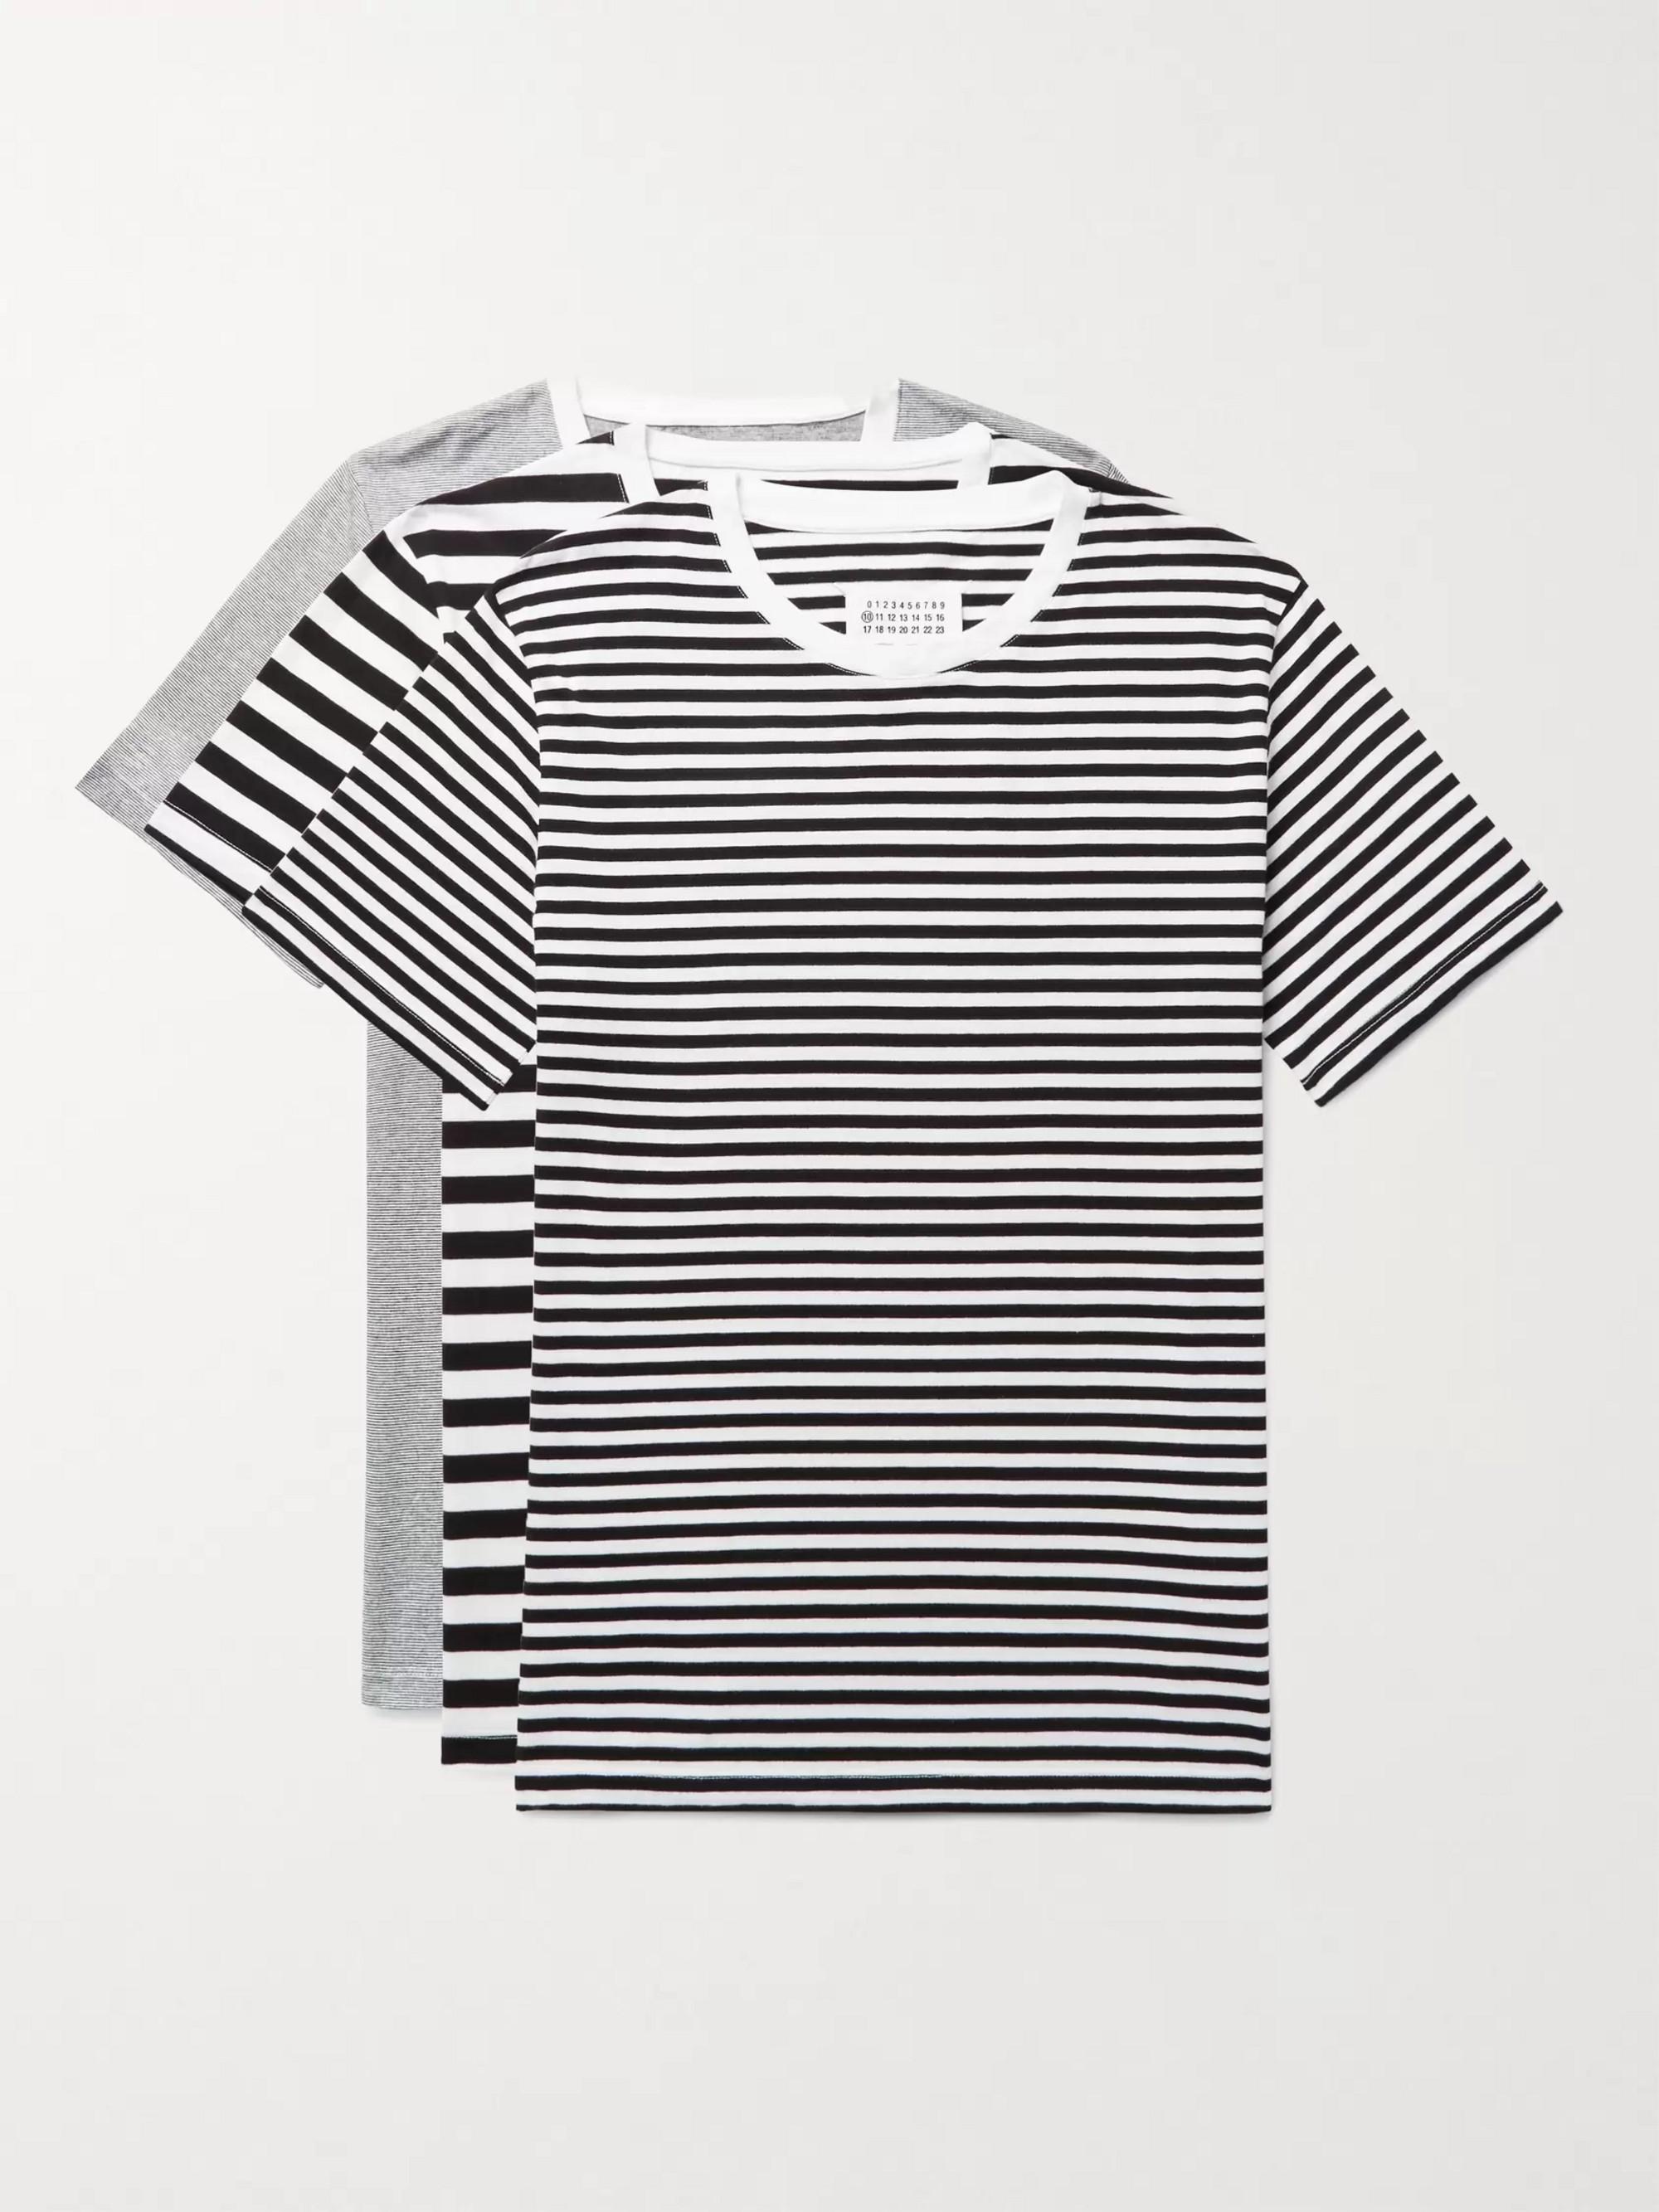 71cd78b2 Maison Margiela Three-Pack Slim-Fit Striped Cotton-Jersey T-Shirts